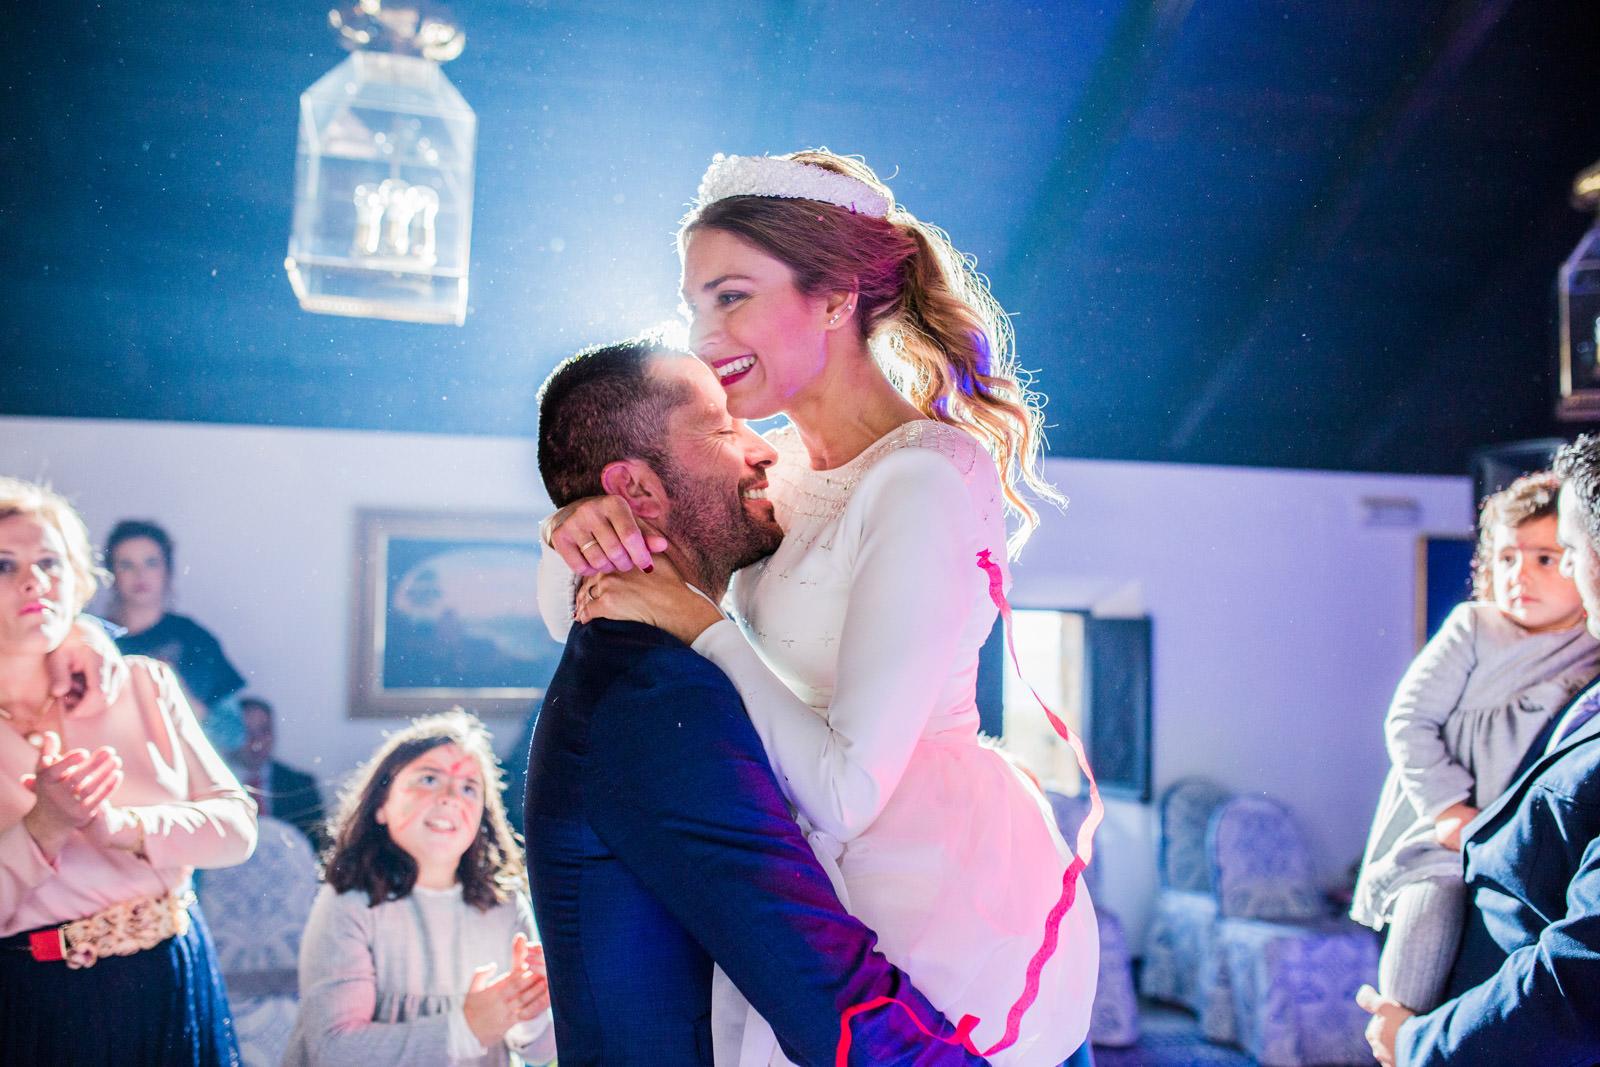 Wedroads-Boda-Sevilla-Parador-Carmona-bridal-engagement-Rafael-Torres-fotografo-bodas-sevilla-madrid-barcelona-wedding-photographer--64.jpg